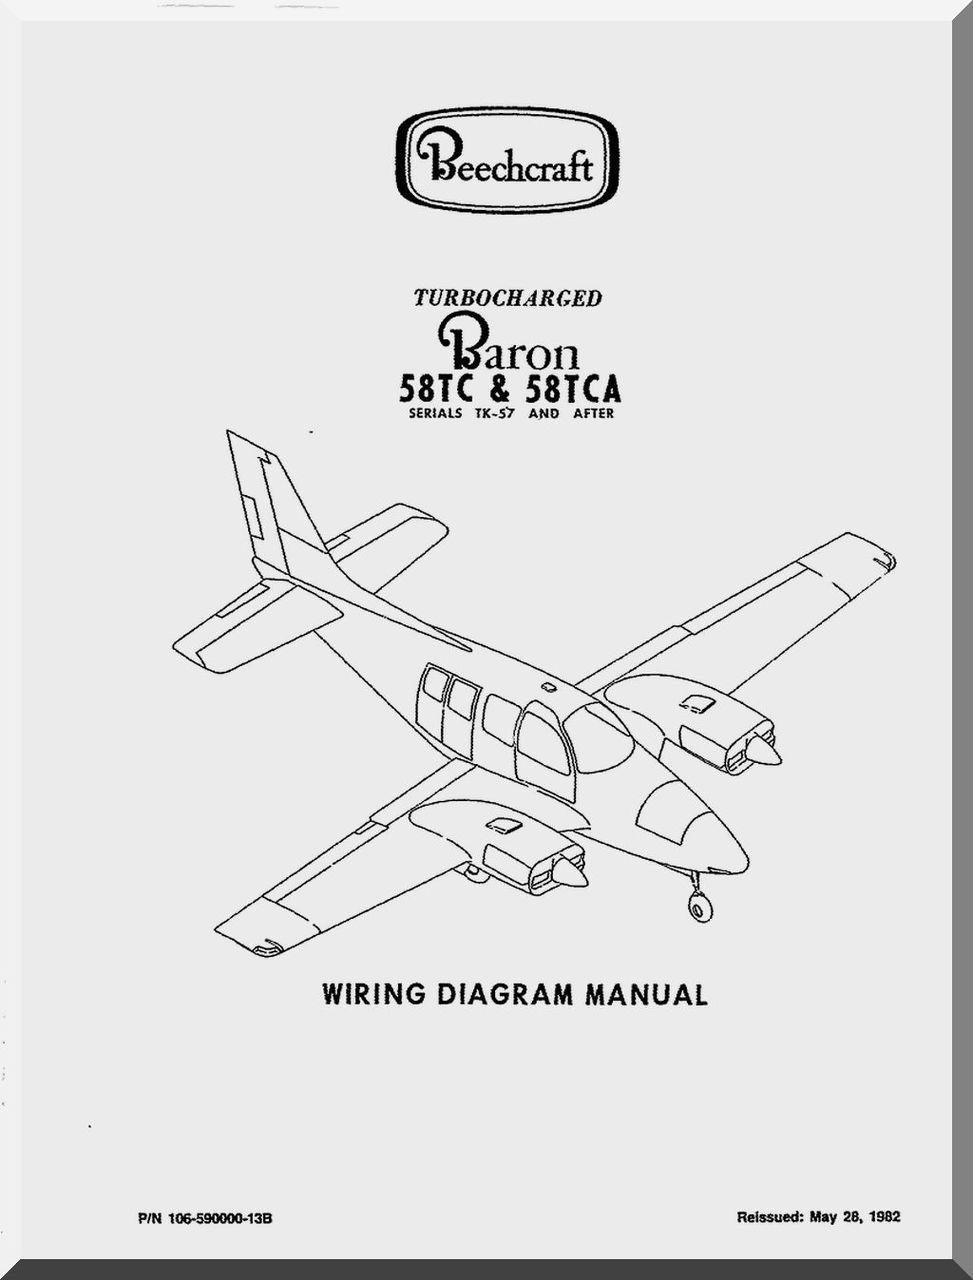 beechcraft baron 58 tc tca aircraft wiring manual 1982 aircraft rh aircraft reports com